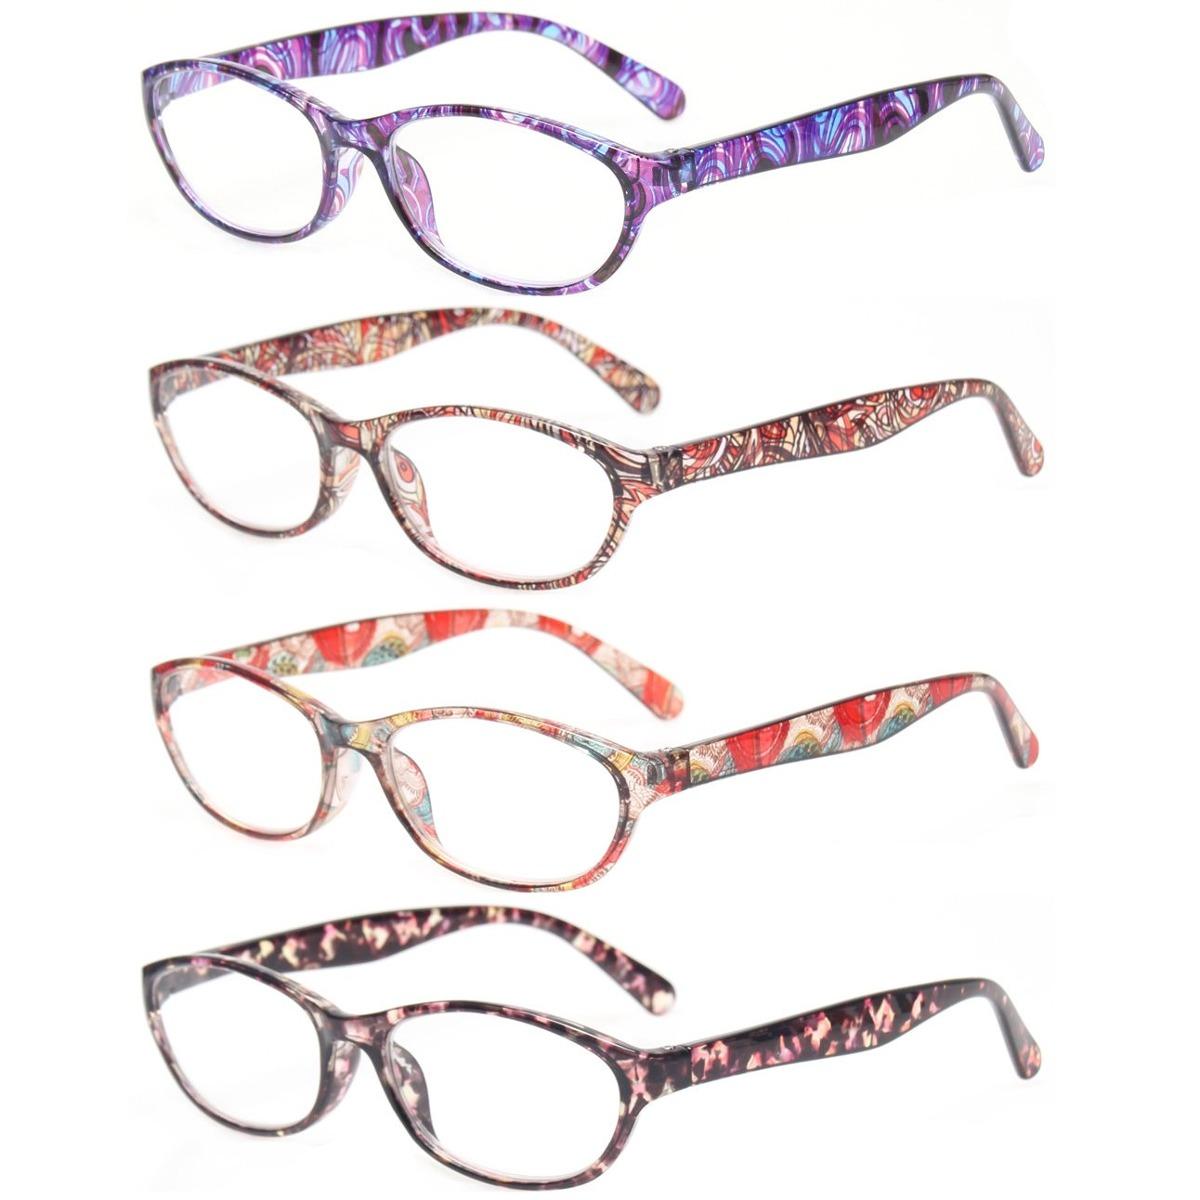 e445597b5c gafas de lectura con diseño floral lectores de moda para. Cargando zoom.